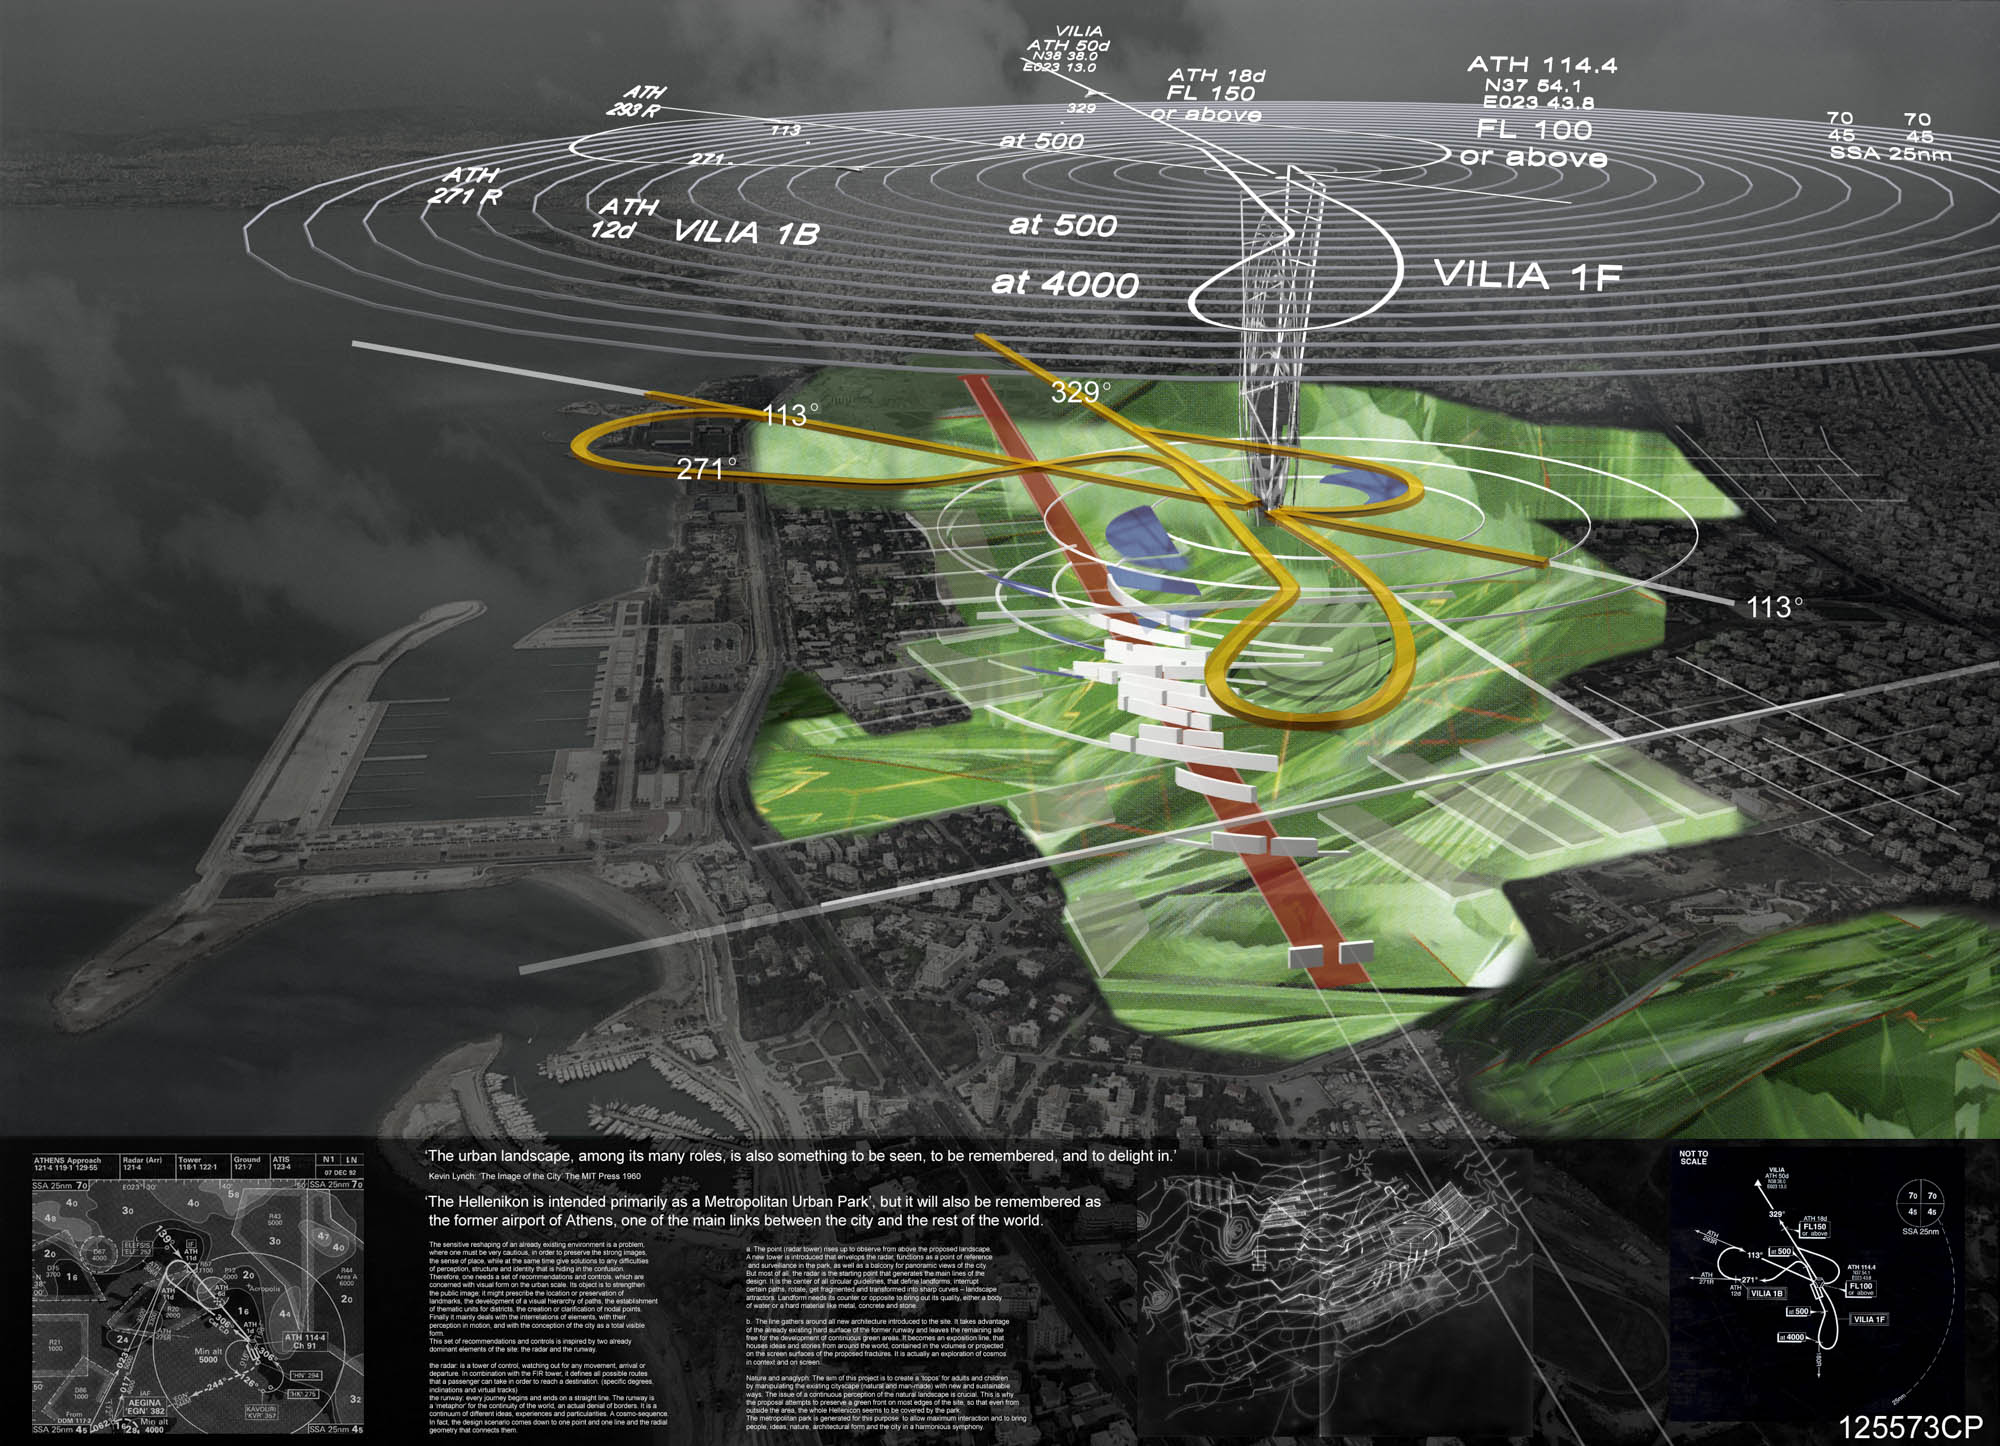 International ideas competition / Hellenikon Metropolitan Park and urban development